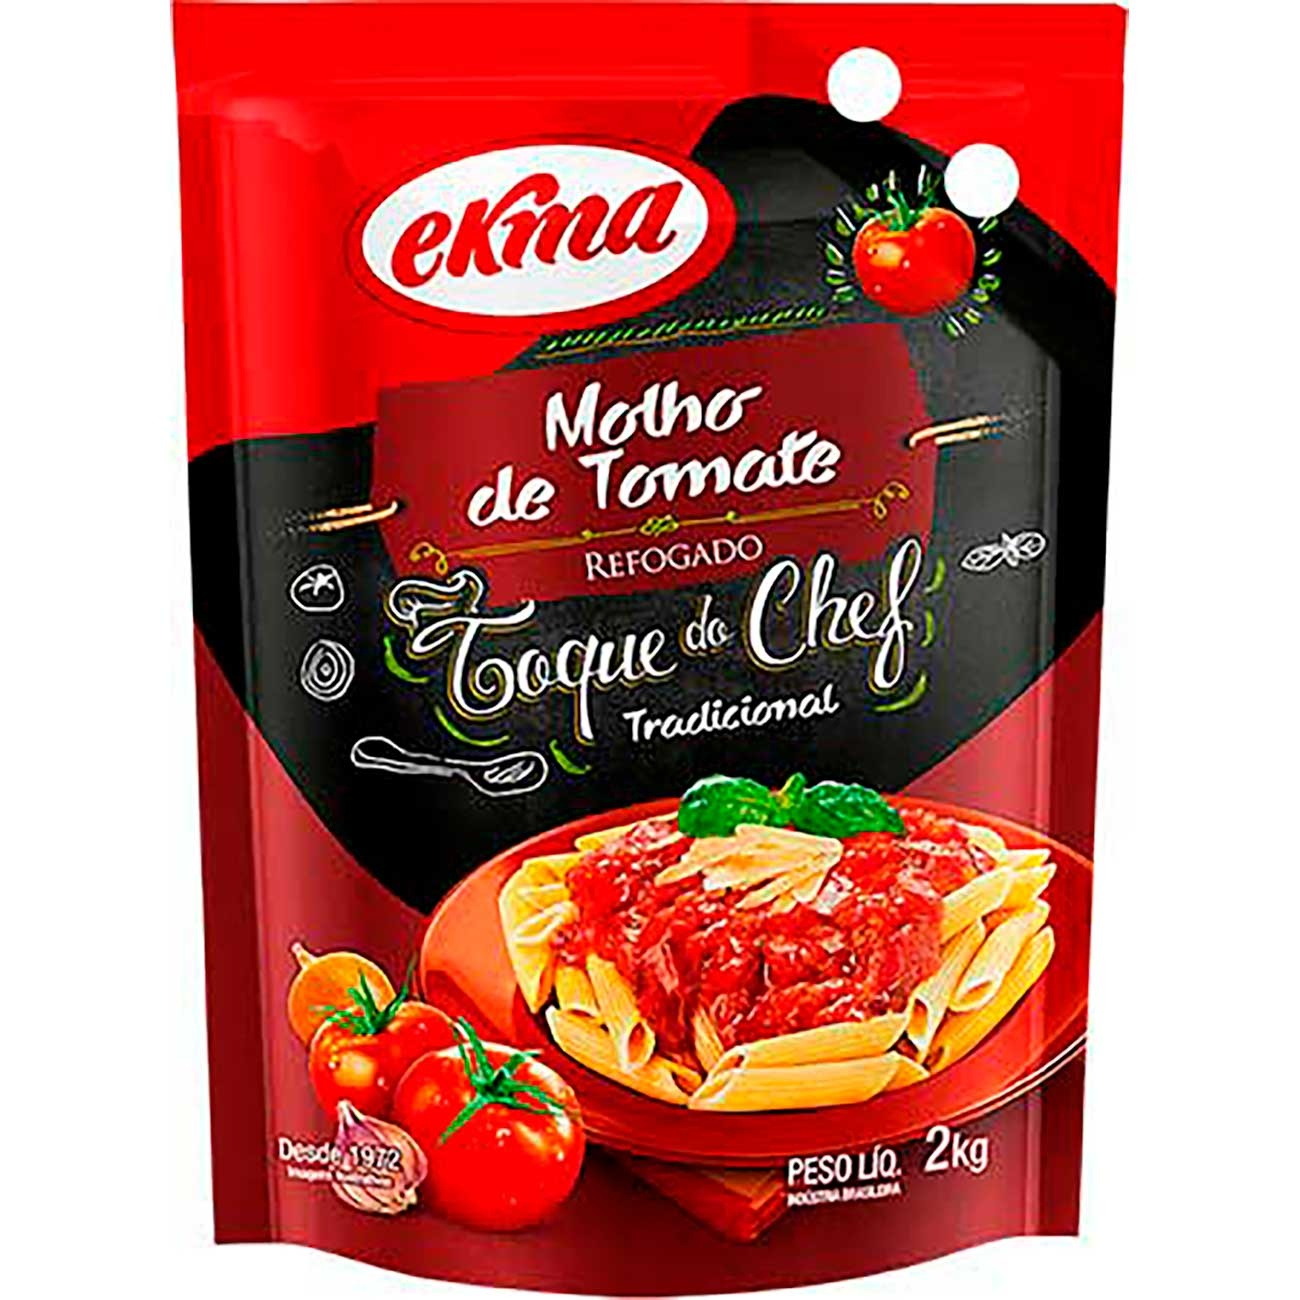 Molho De Tomate Ekma Tradicional Pouch 2kg